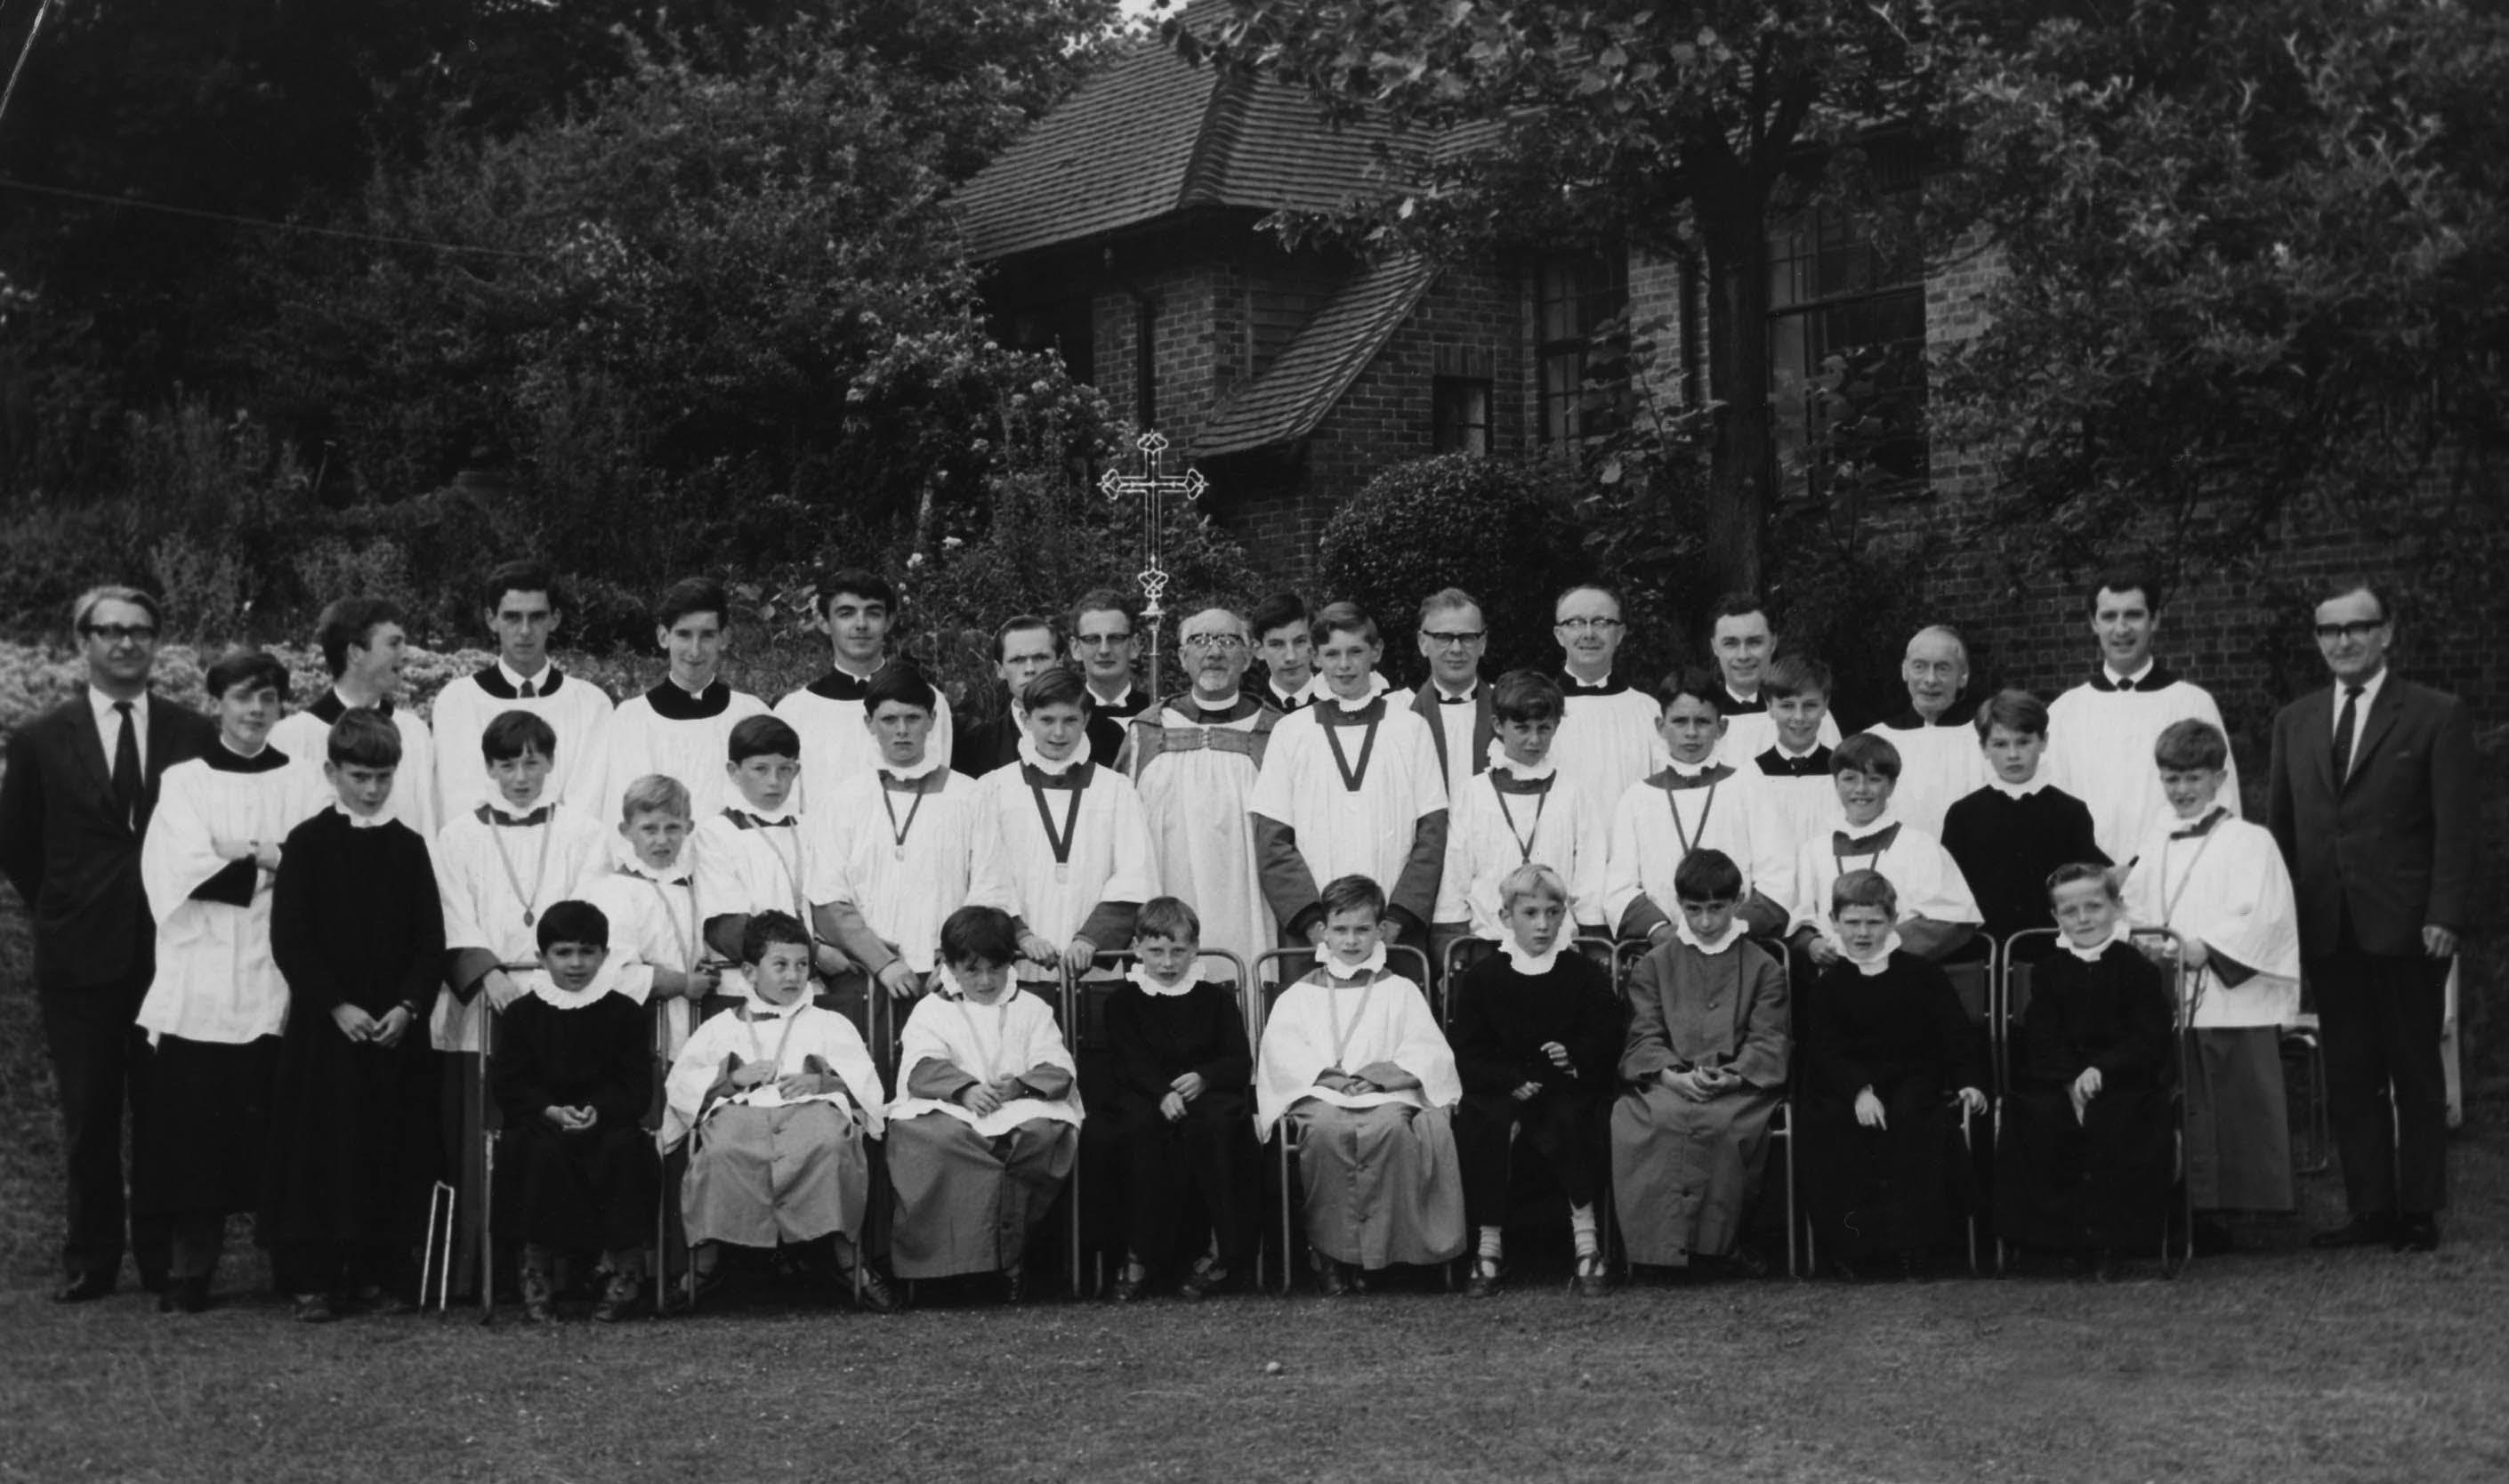 Boys and men choir 1966